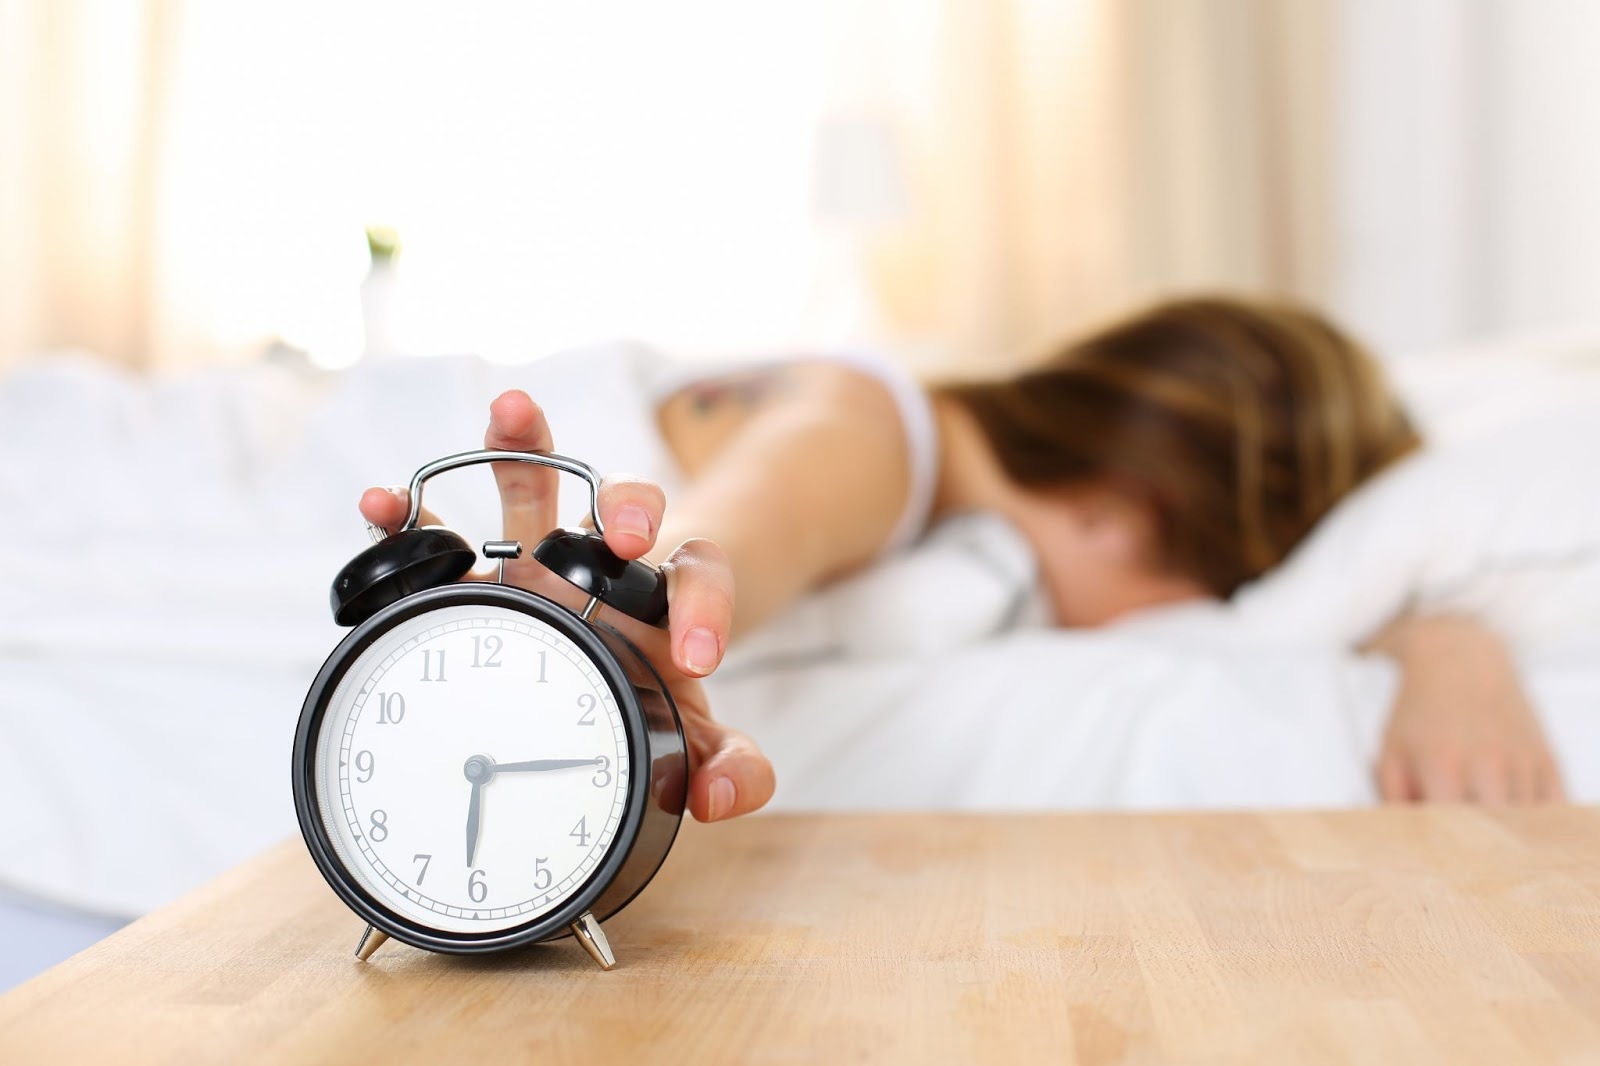 Sleep inertia: A woman reaches to turn off her alarm clock